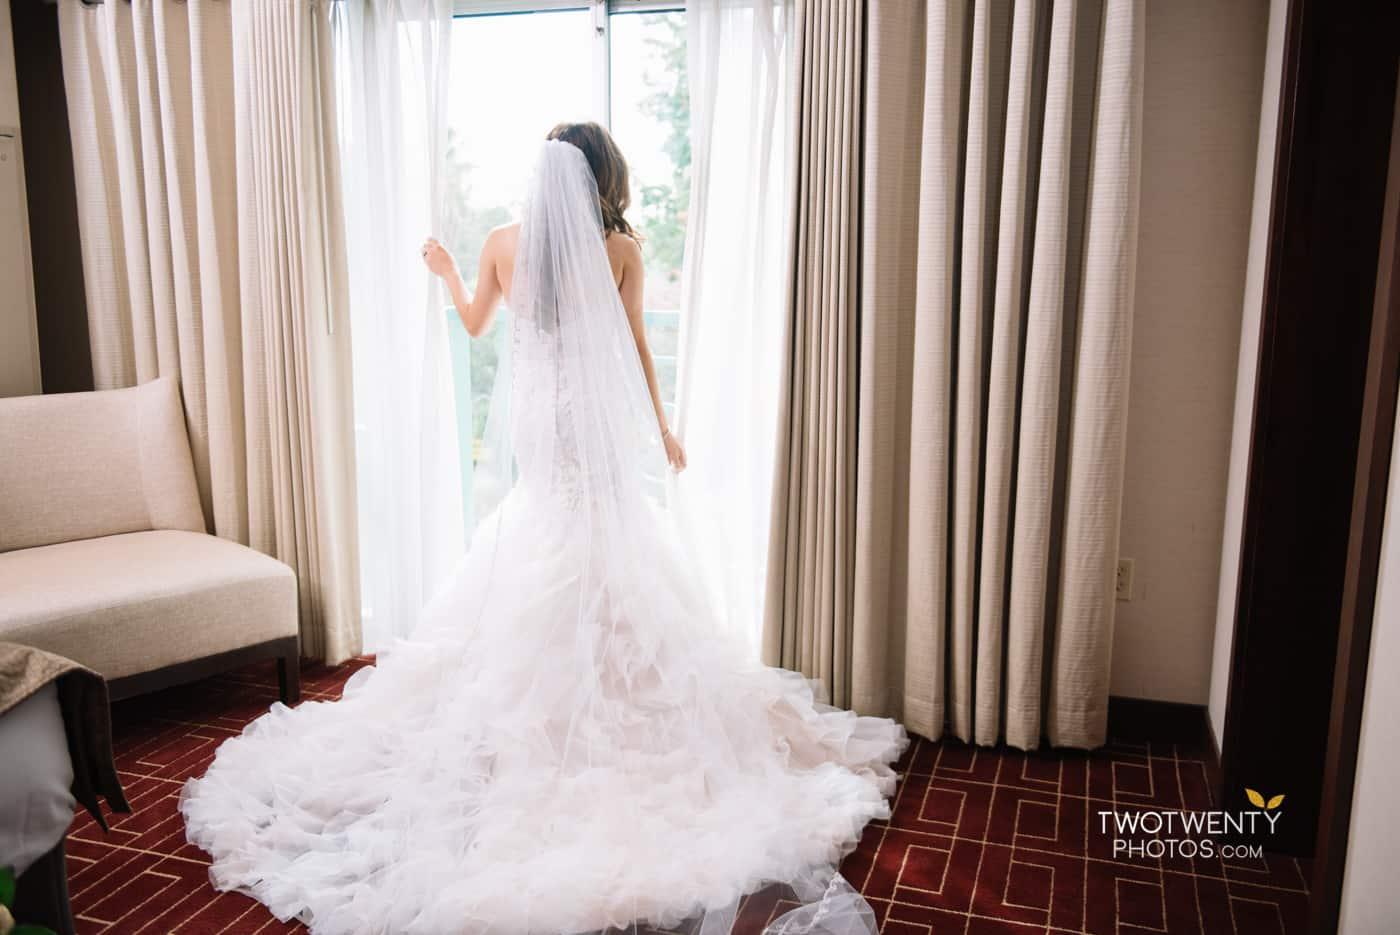 hyatt-regency-downtown-sacramento-wedding-photographer-26